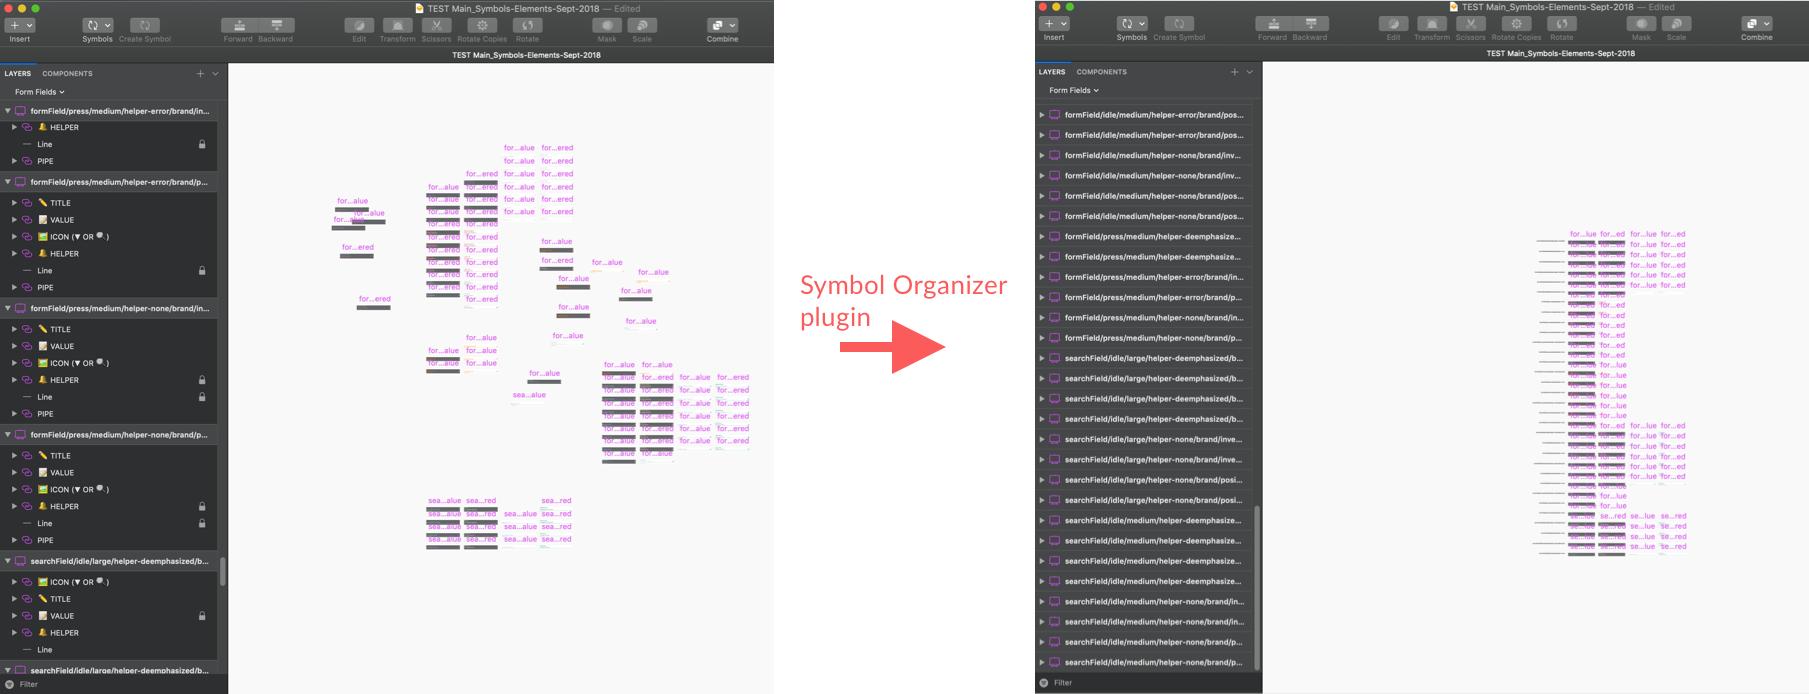 Symbol Organizer plugin organizing artboards.